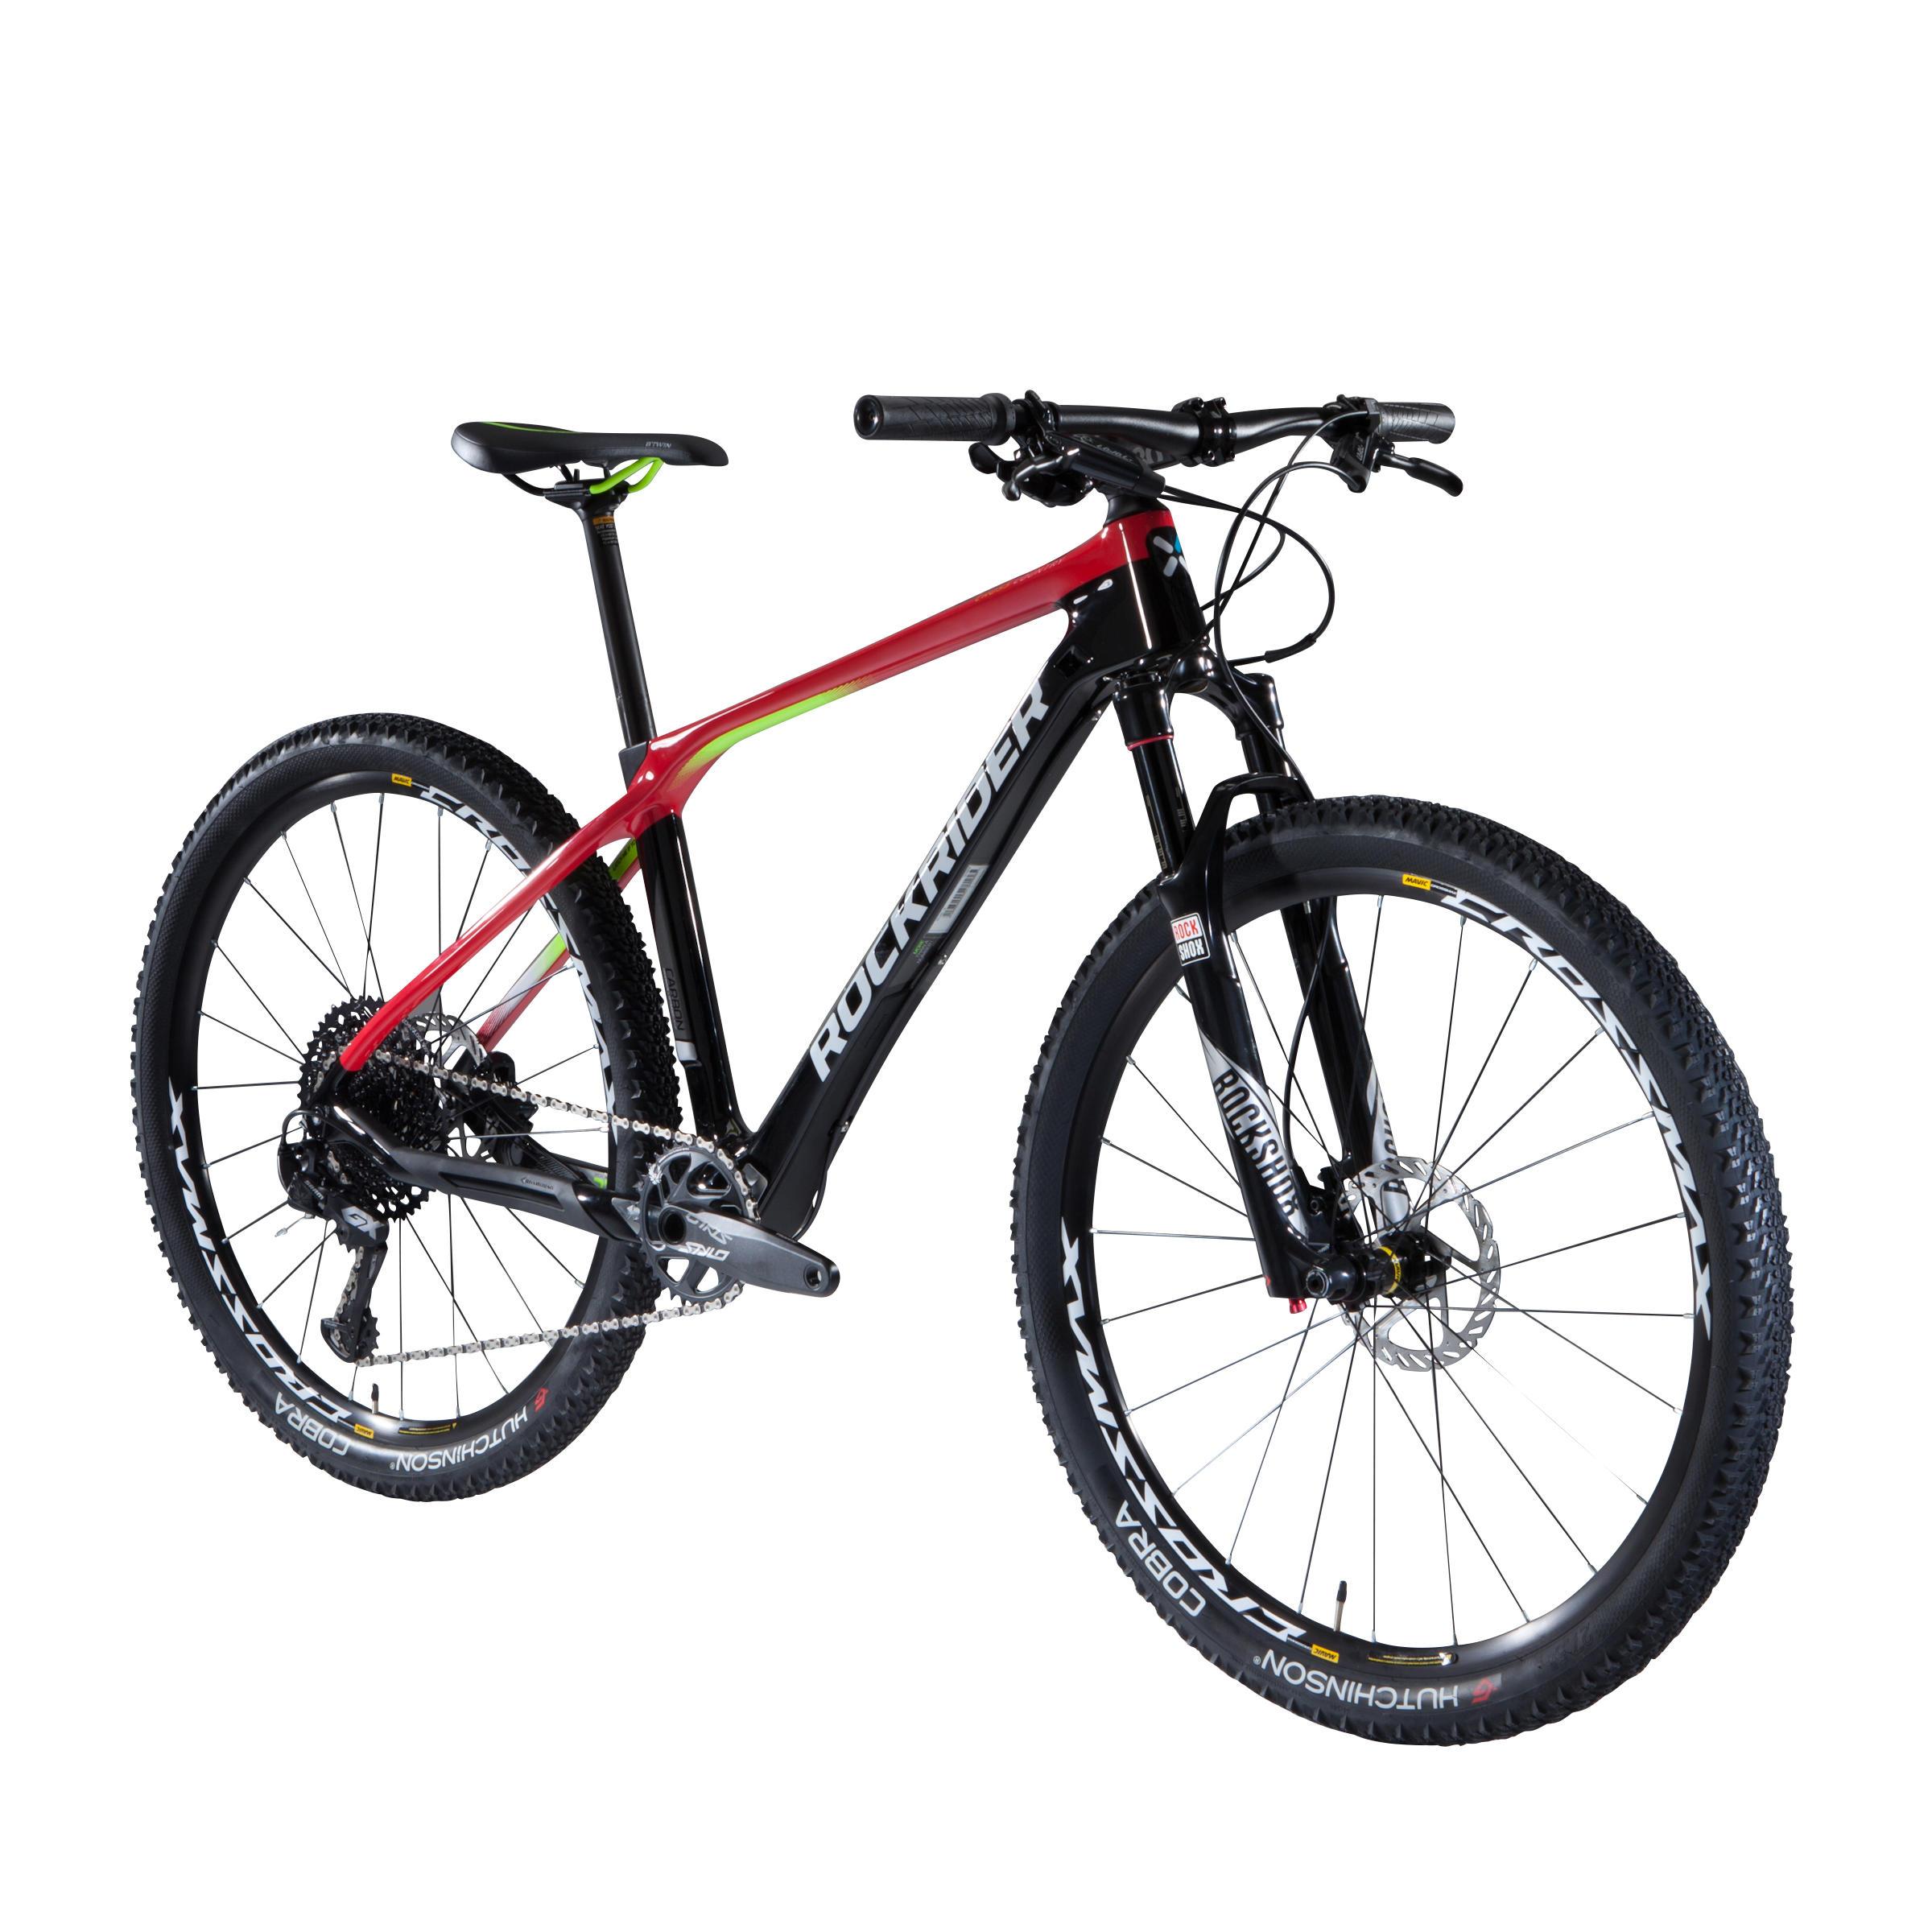 Mountainbike Mtb Gnstig Online Kaufen Btwin Decathlon Full Bike Pro M 2000